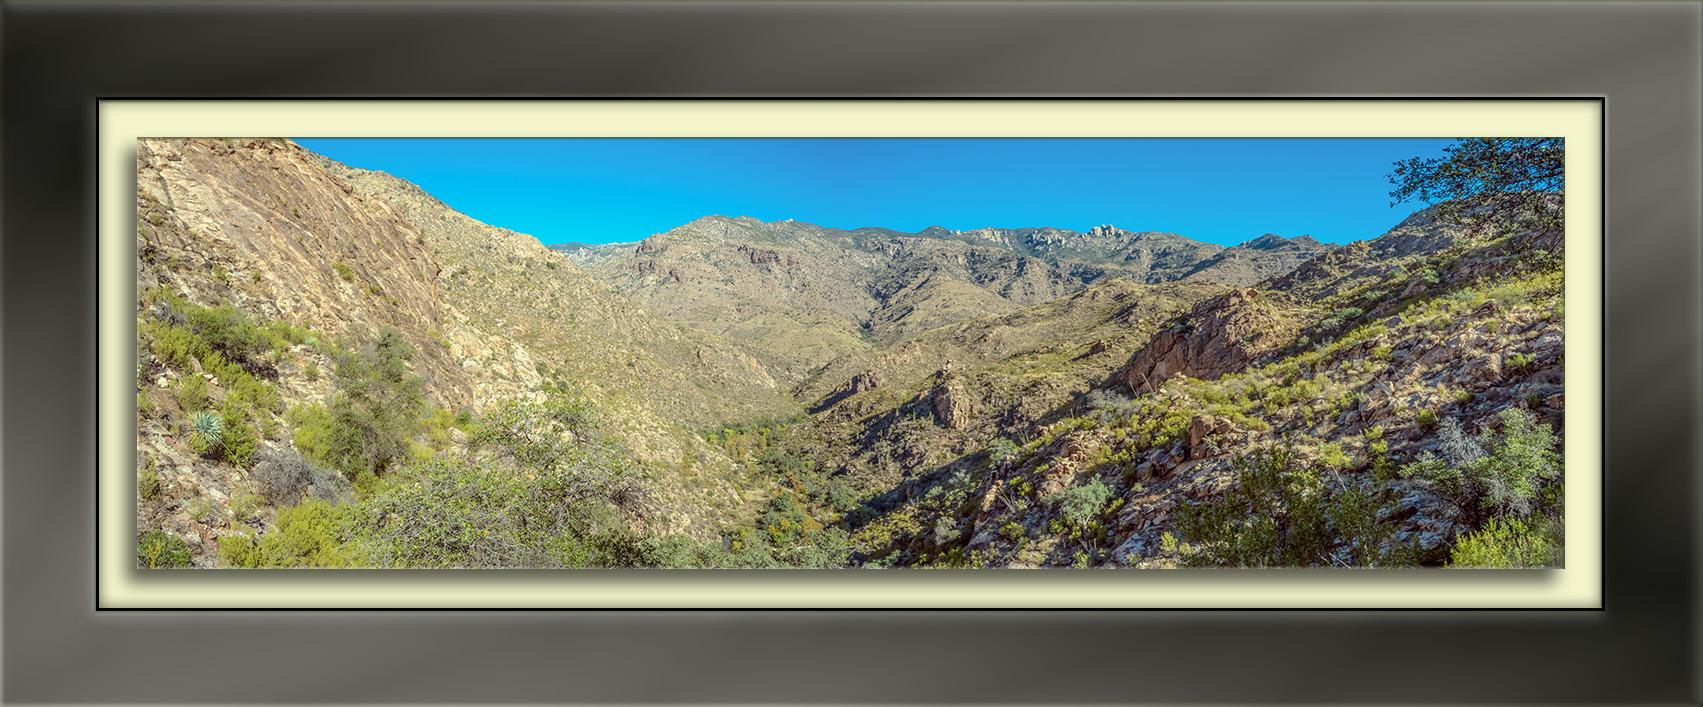 upper-sabino-canyon-panorama-1-of-1-blog